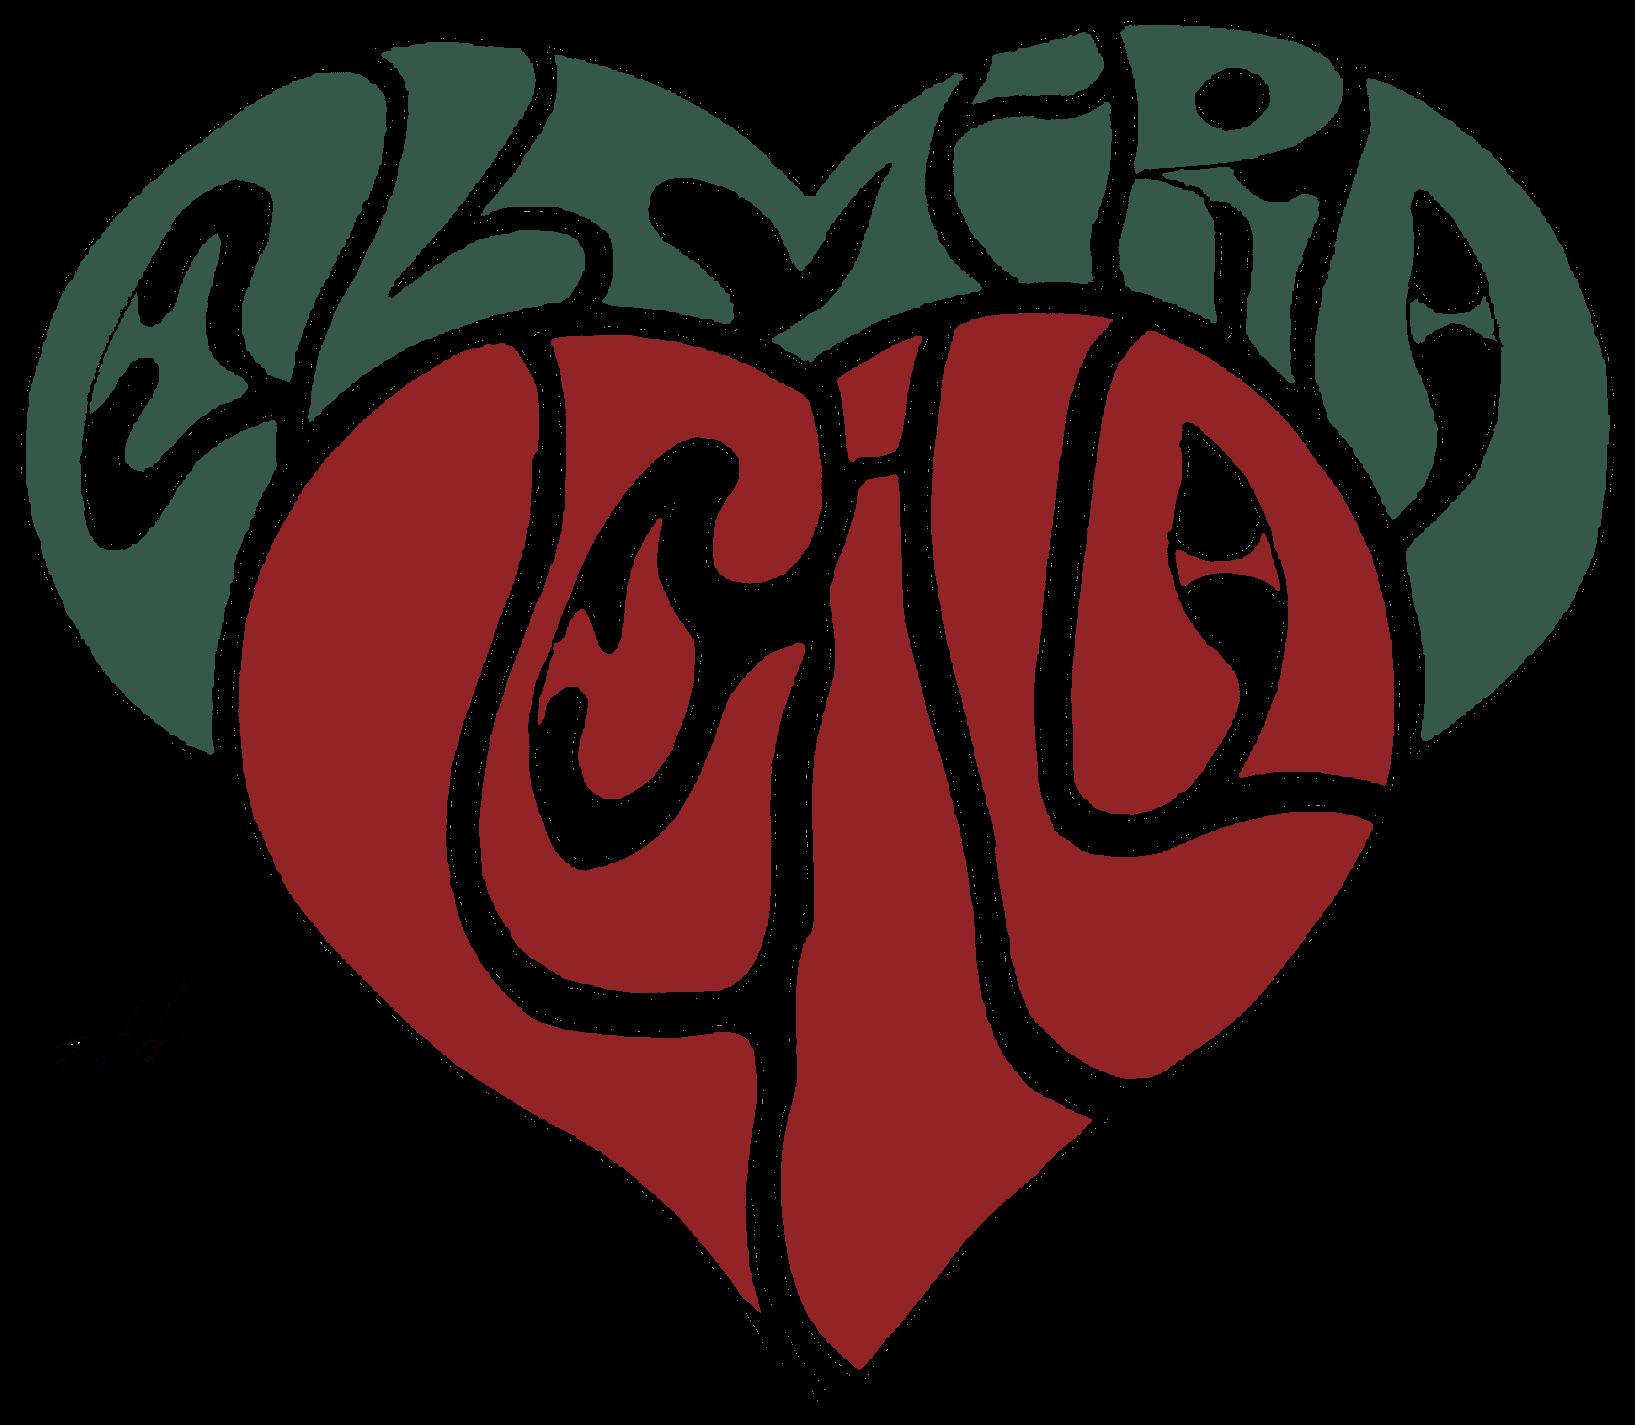 Elmira Leila Heart